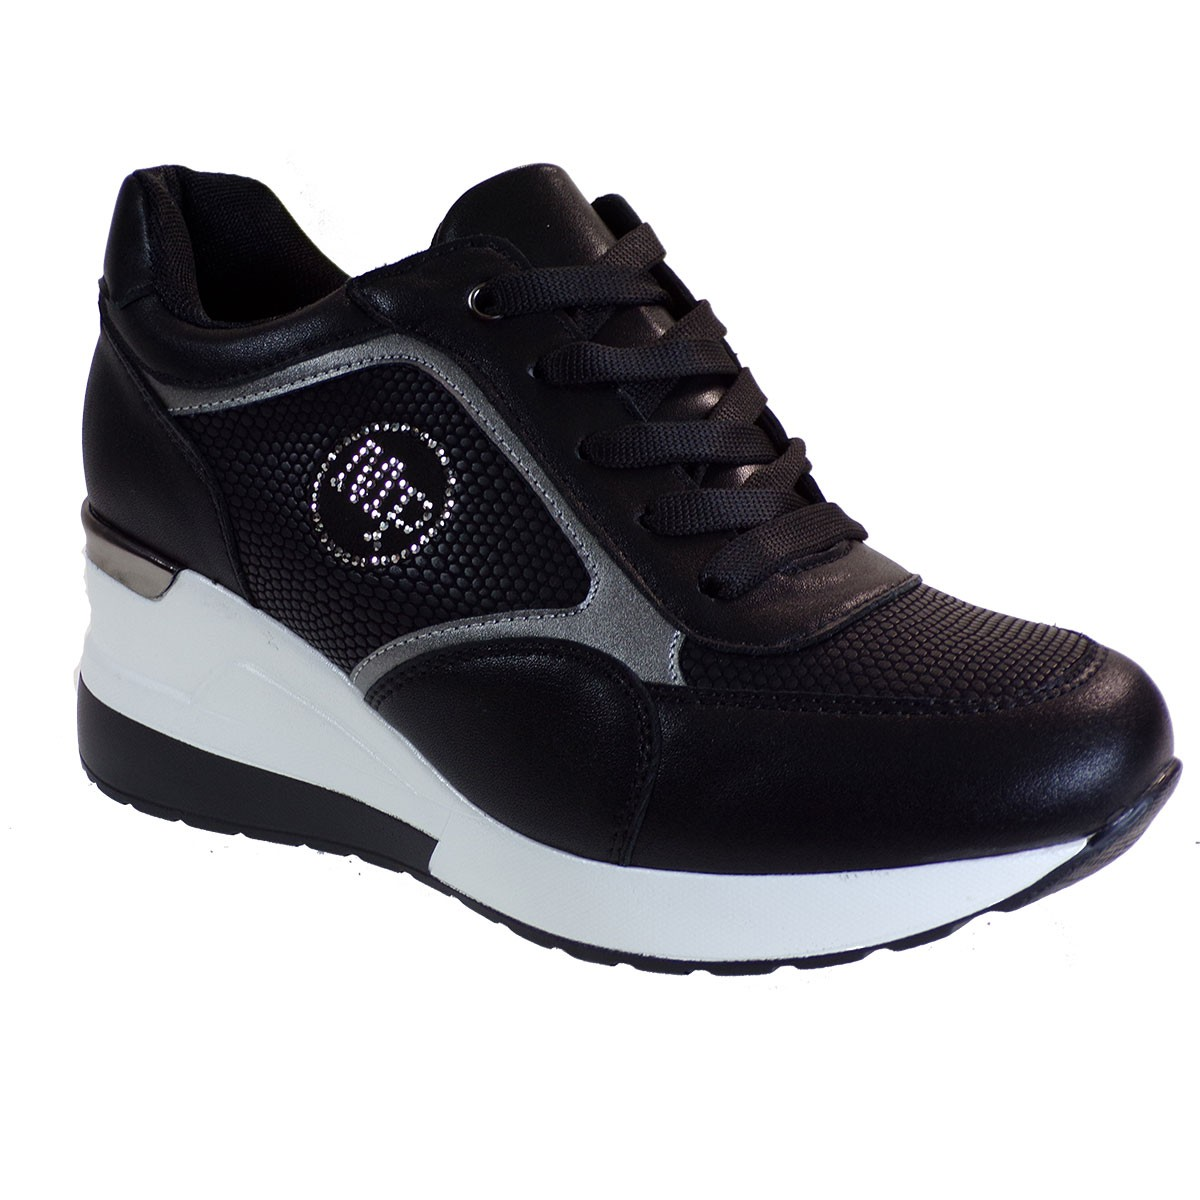 Bagiota Shoes Γυναικεία Παπούτσια Sneakers Αθλητικά H8987 Μαύρο